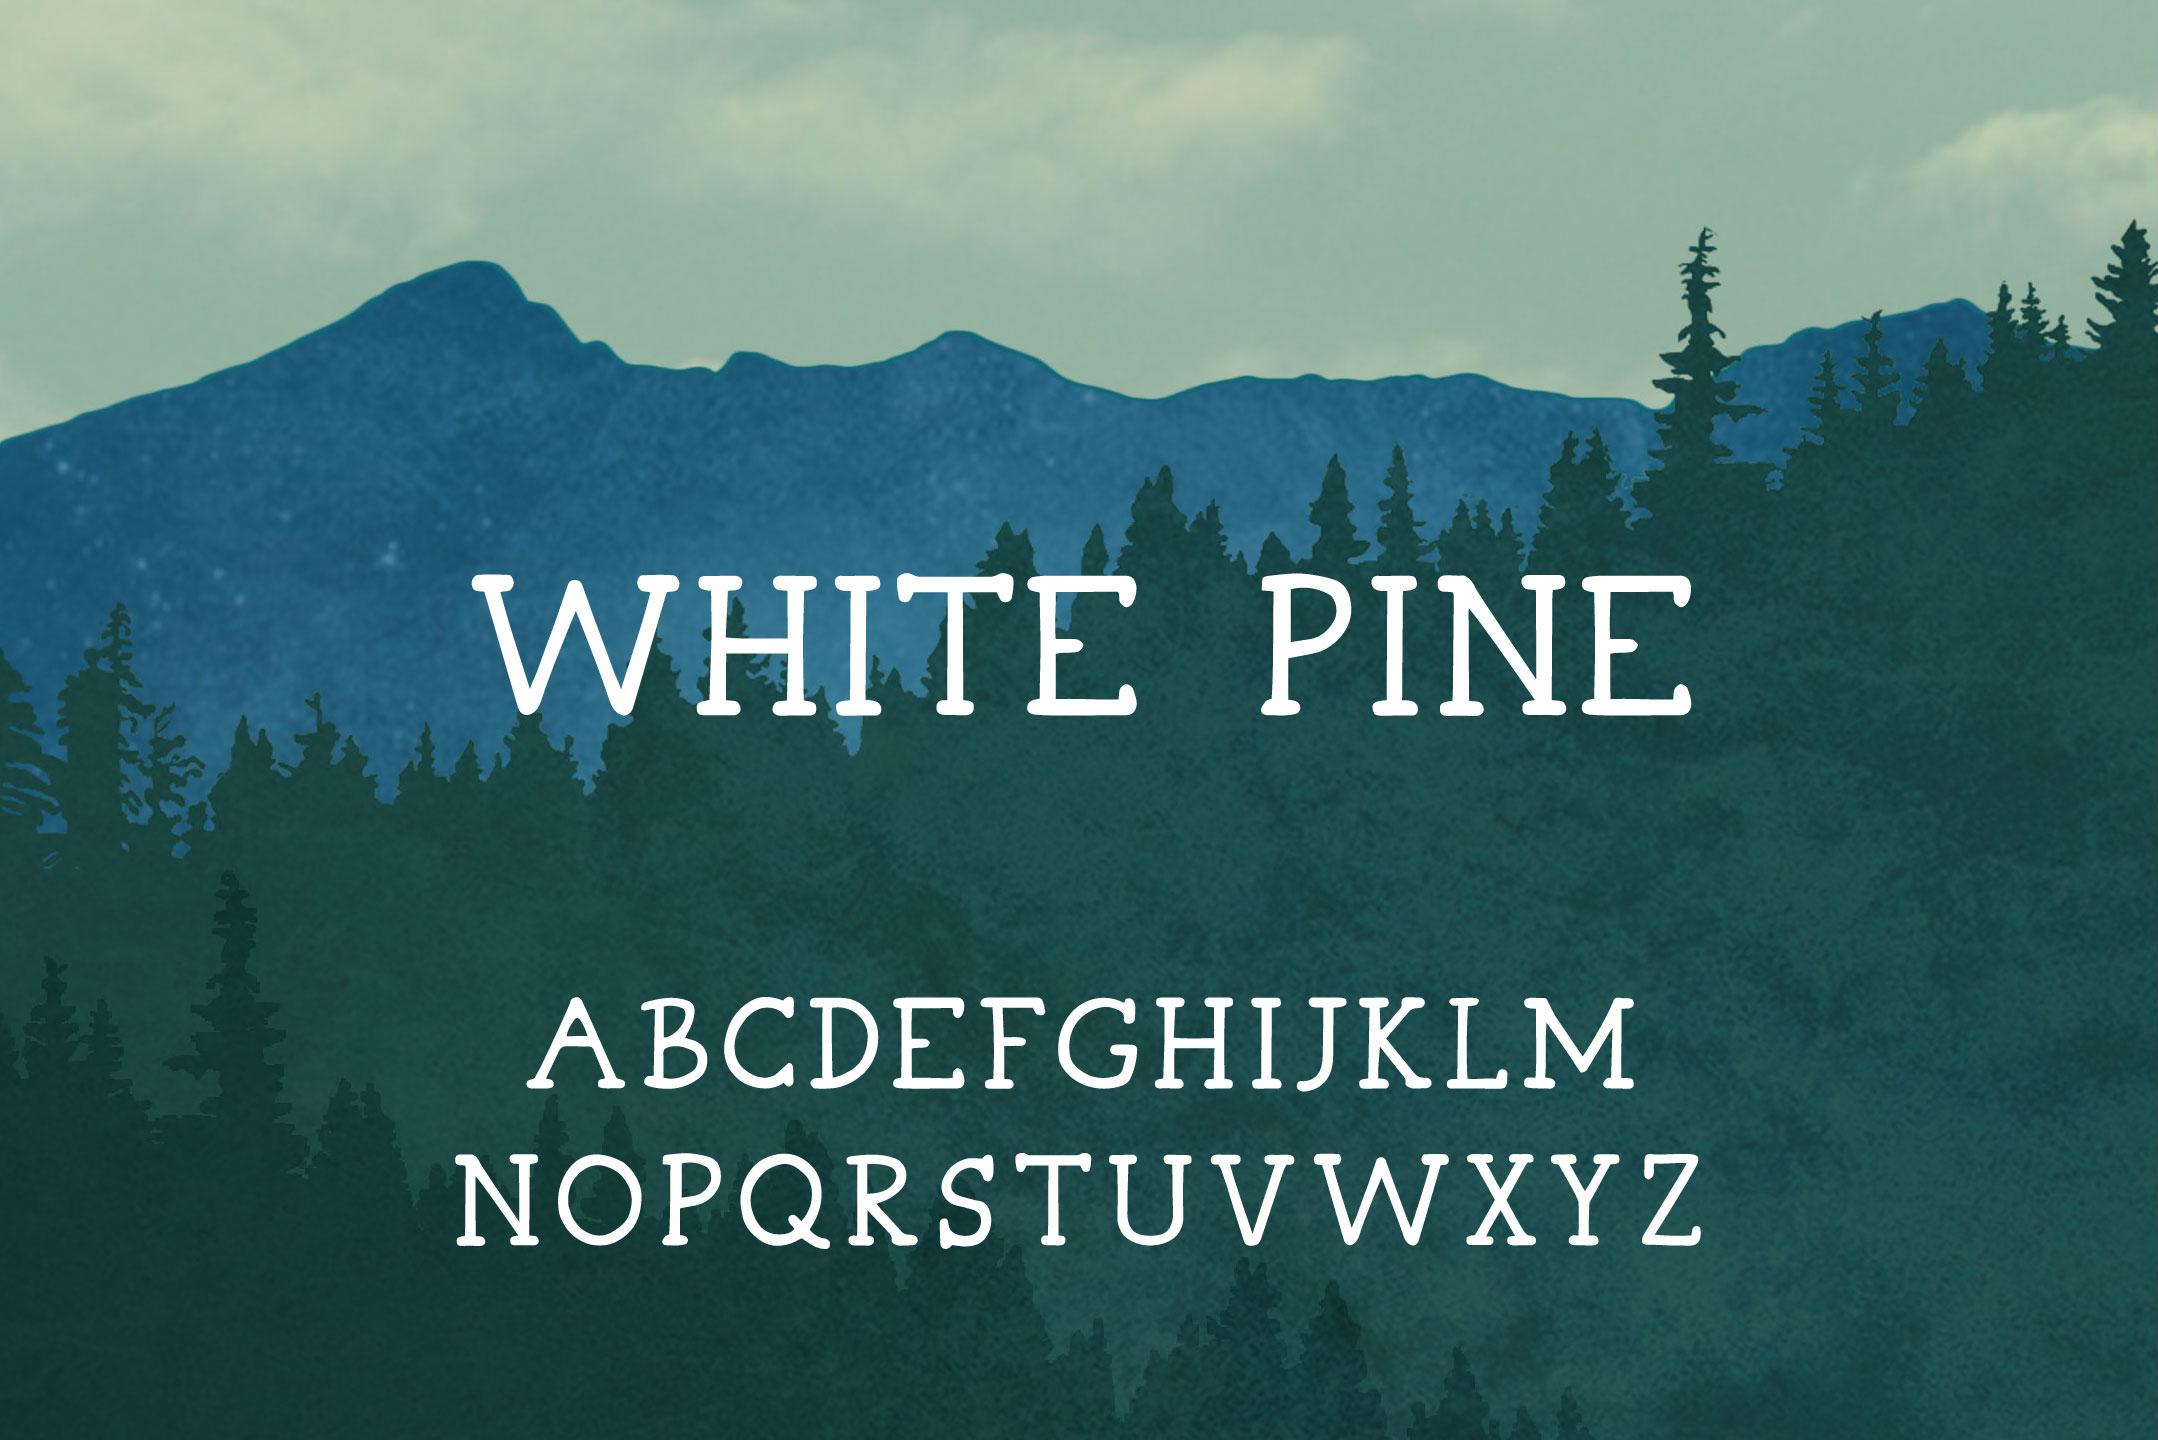 whitepine